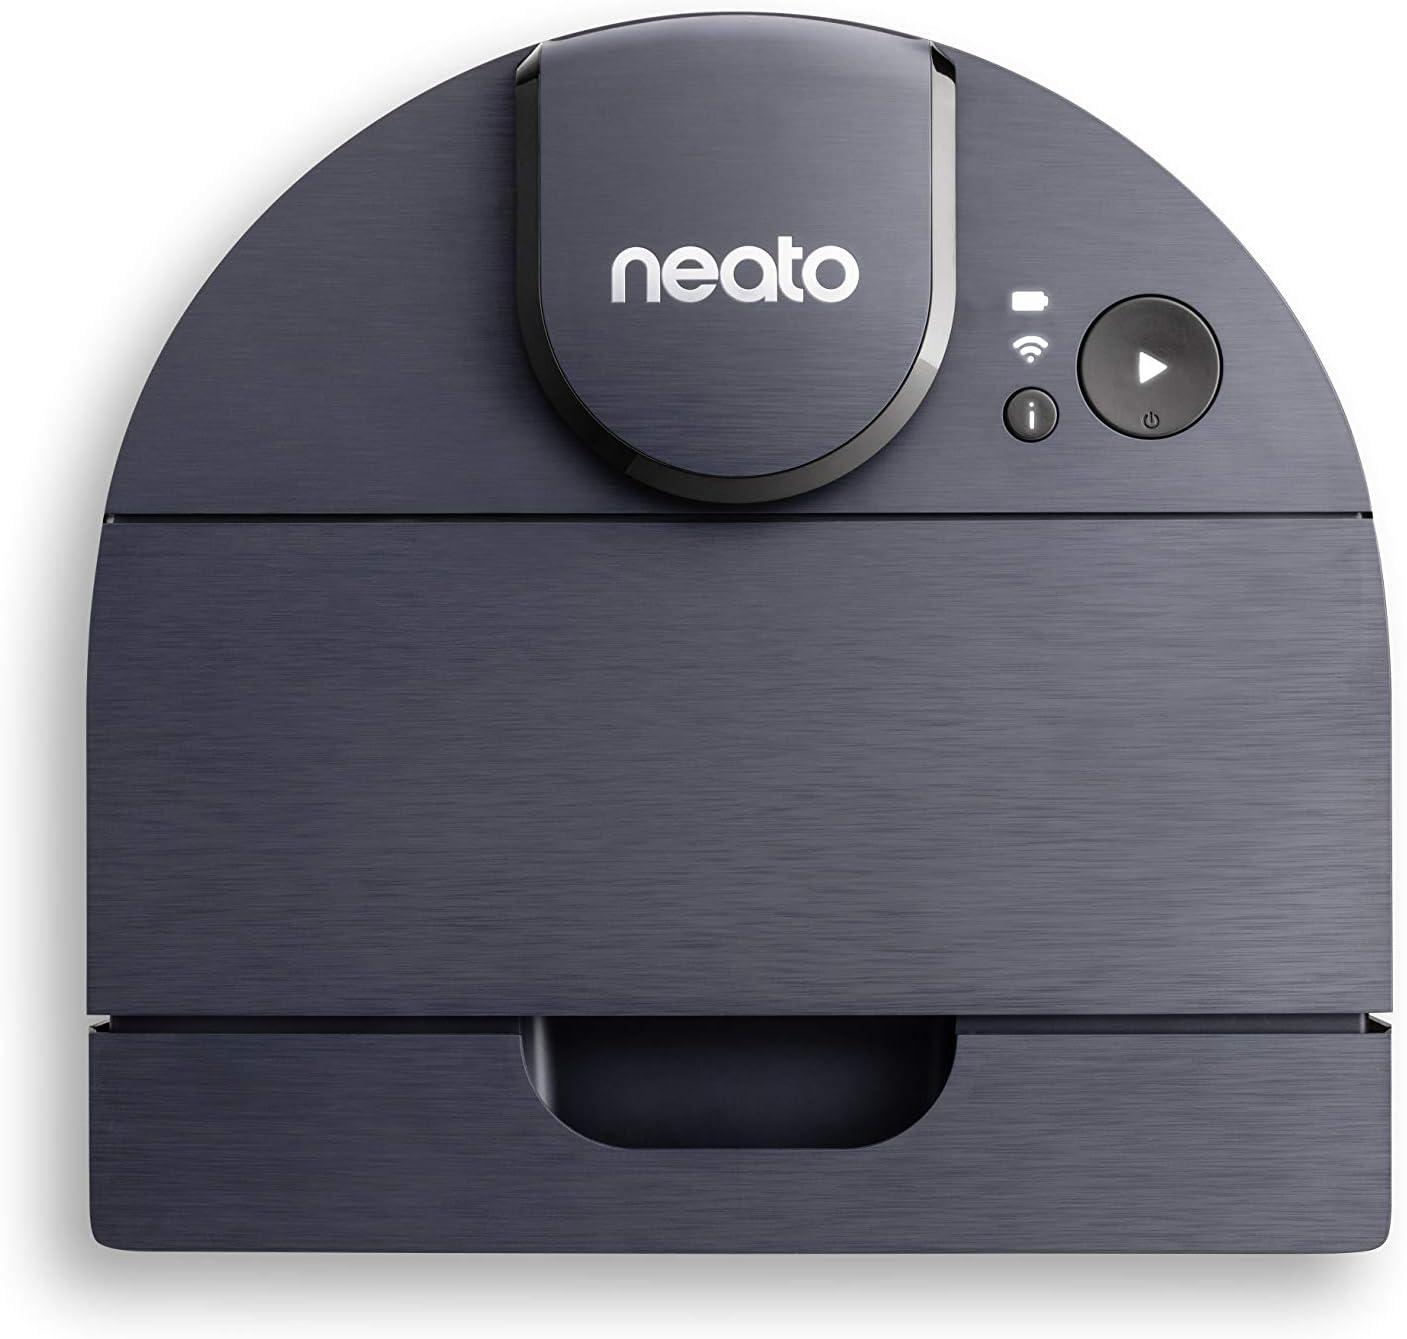 Neato Robotics D8 Intelligent Robot Aspirateur, Aspirateur Robot avec navigation laser, longue...